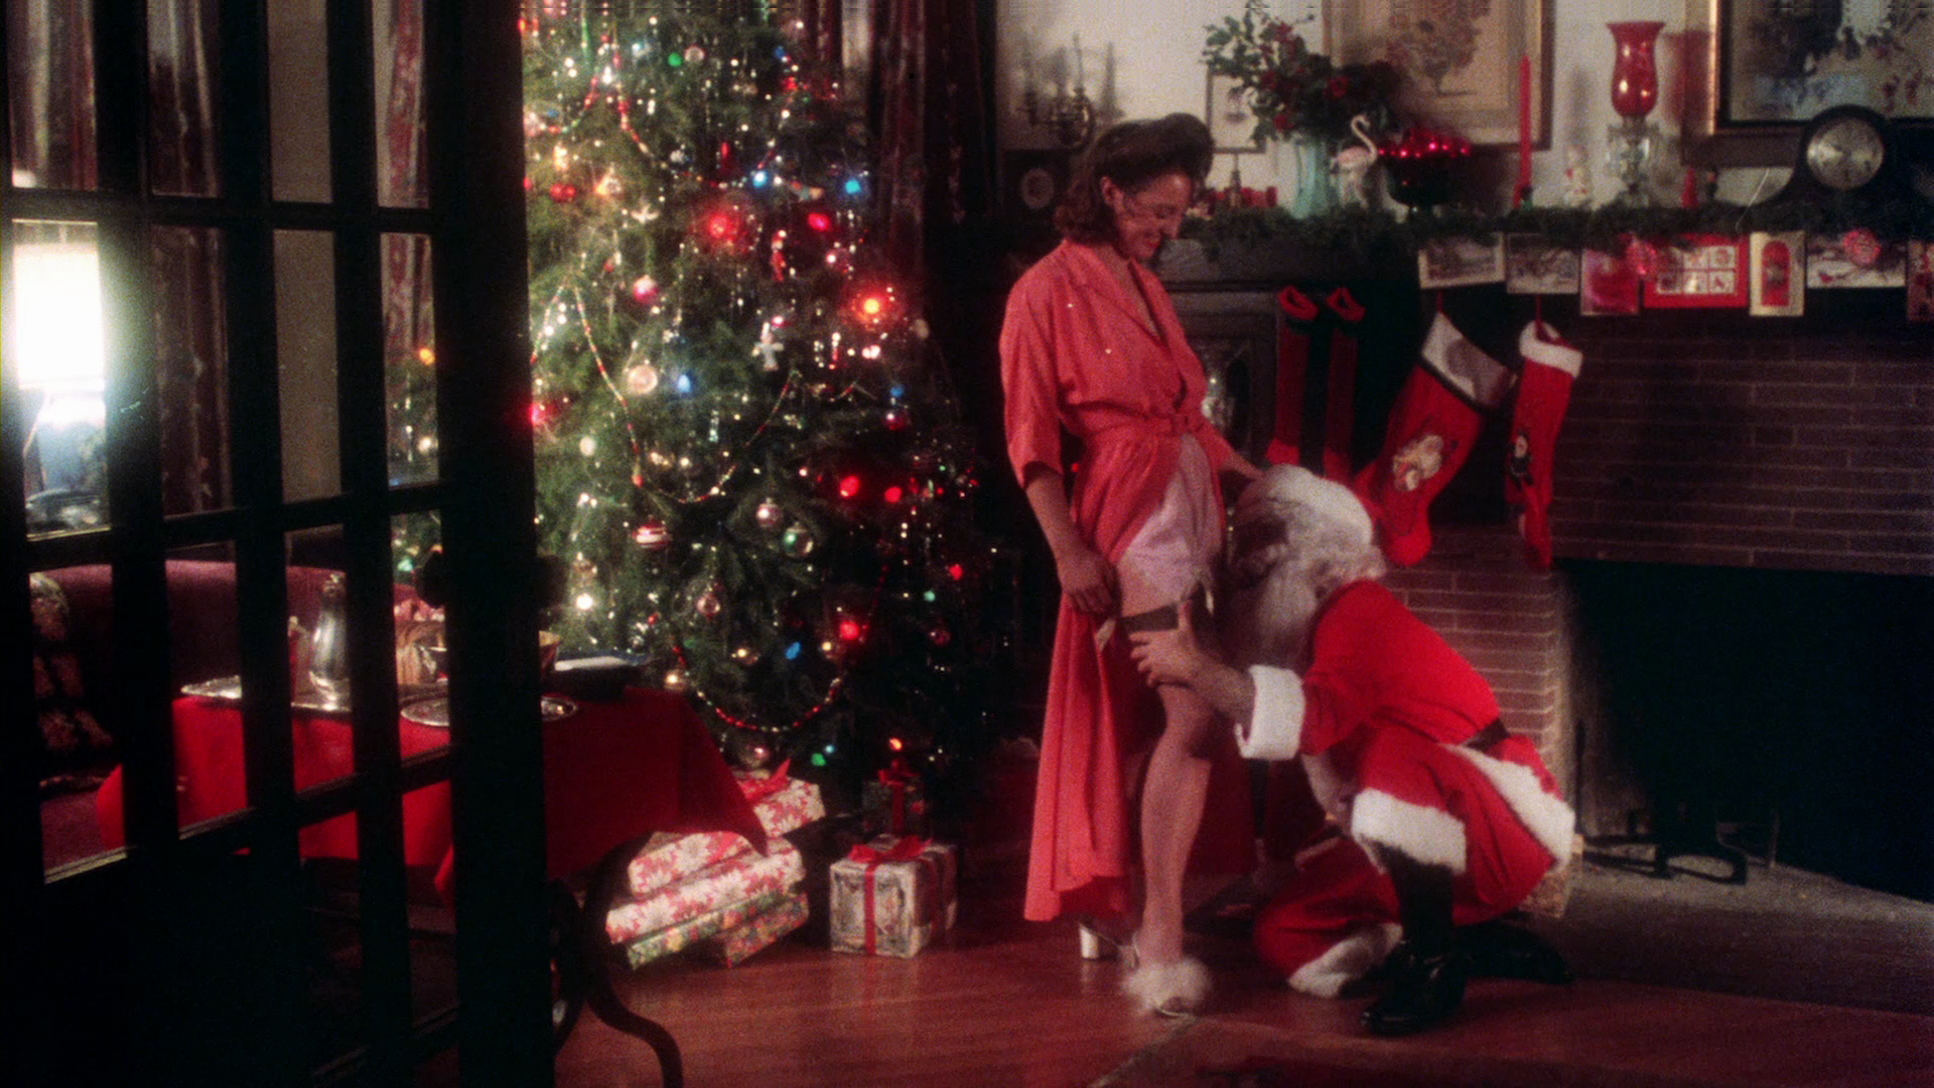 Christmas Evil 1980.Christmas Evil 1980 Dir Lewis Jackson Boston Hassle